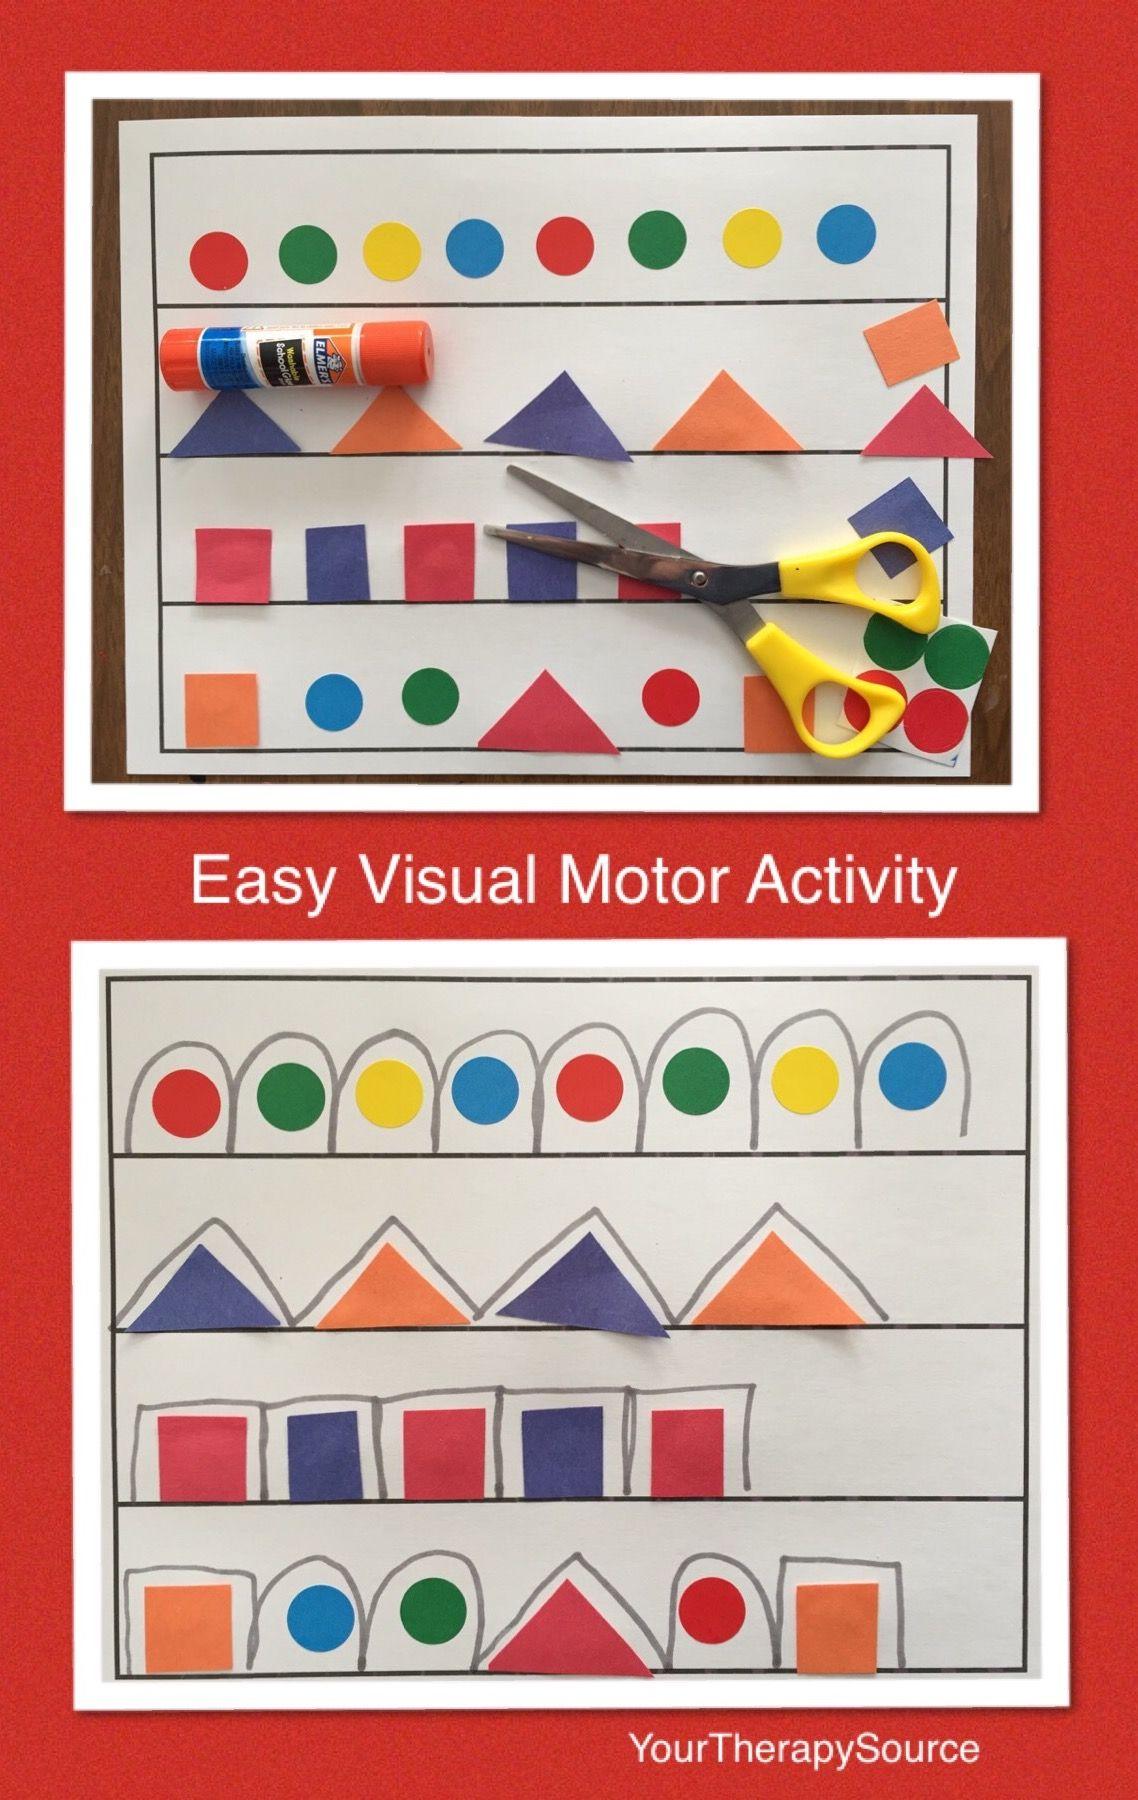 Easy Visual Motor Activity